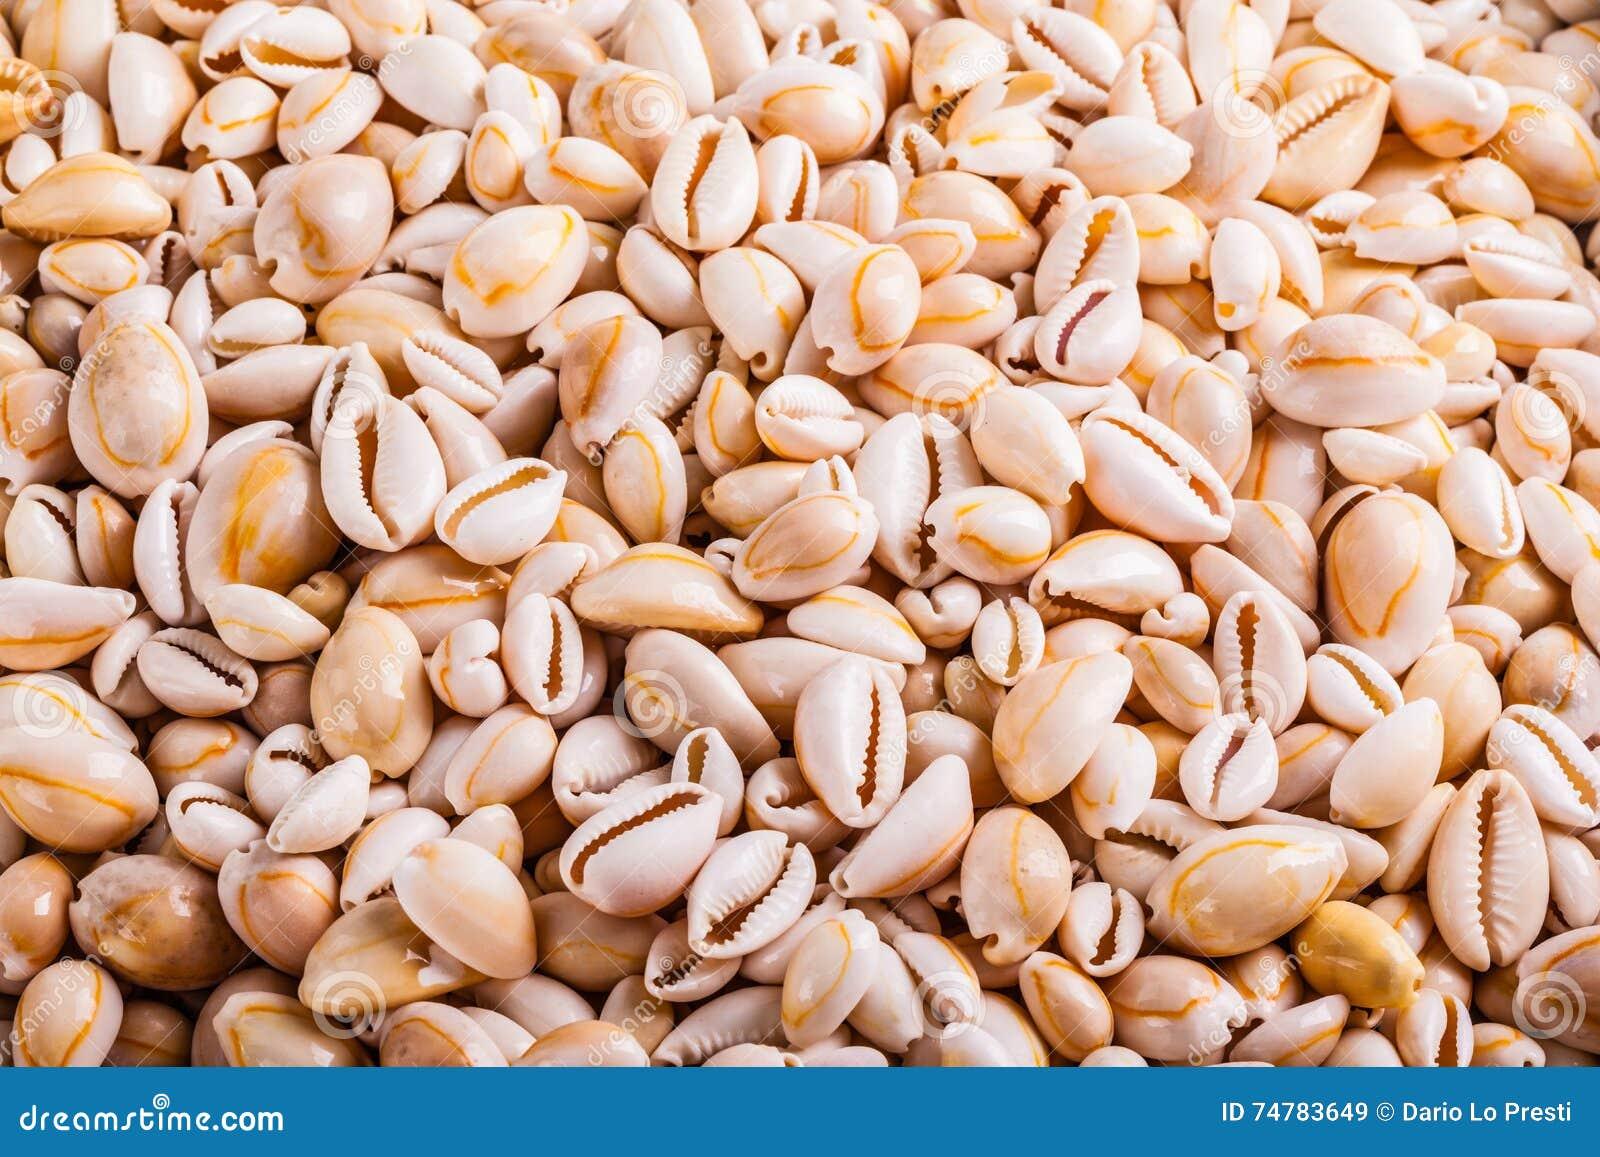 Tropical seashell heap stock image. Image of shell, assortment - 74783649